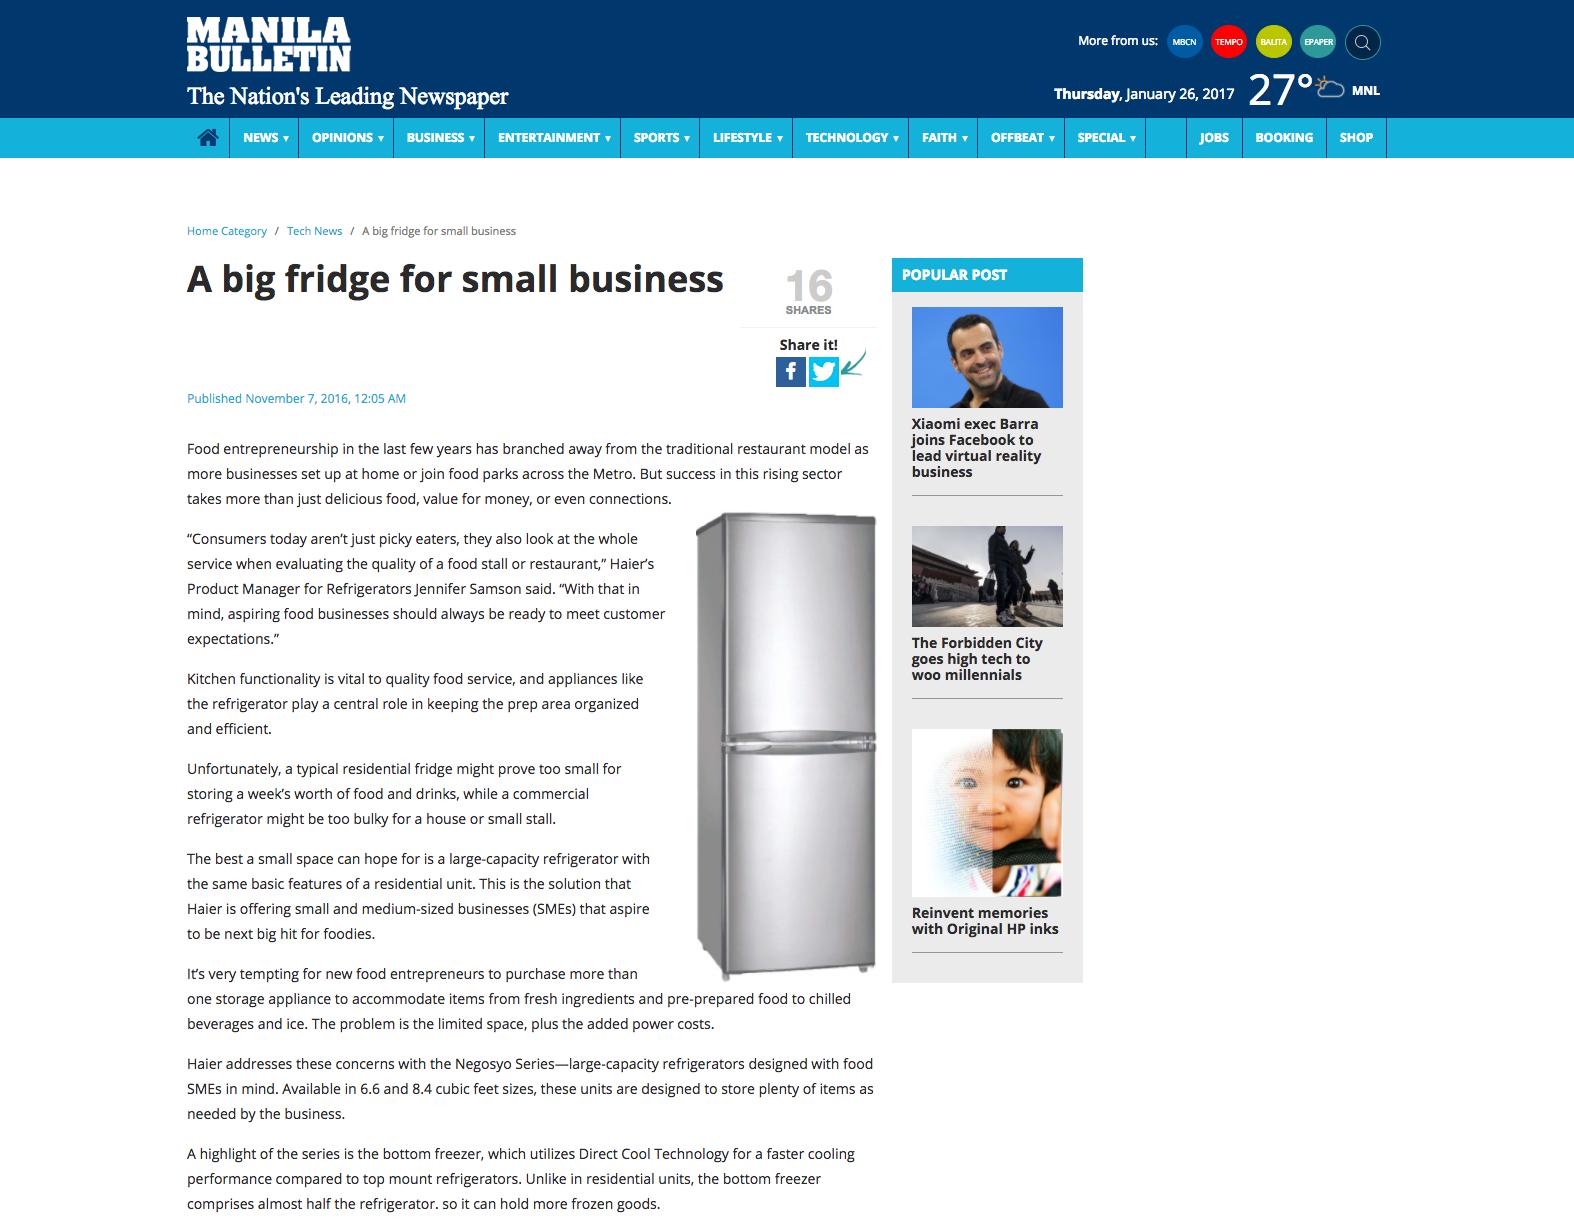 Haier: Big Fridge For Small Business